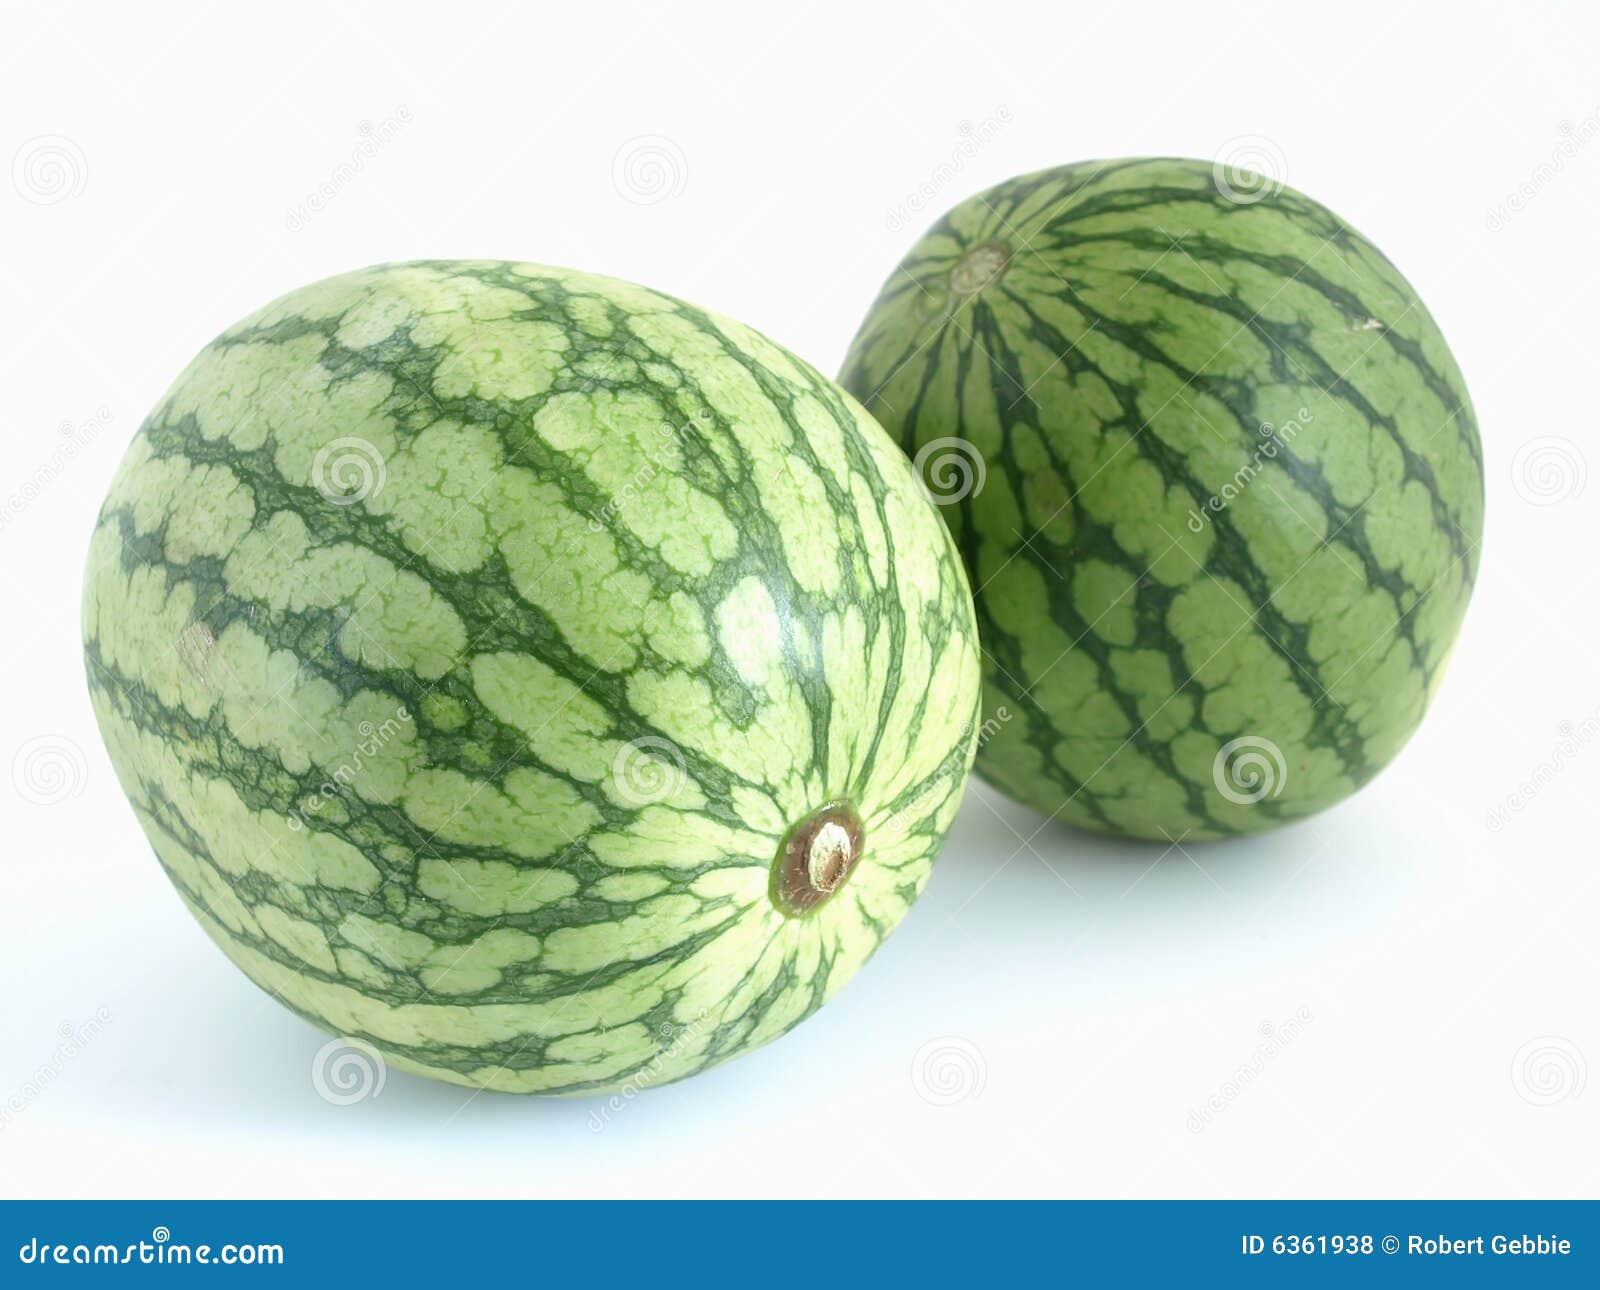 melonsclips